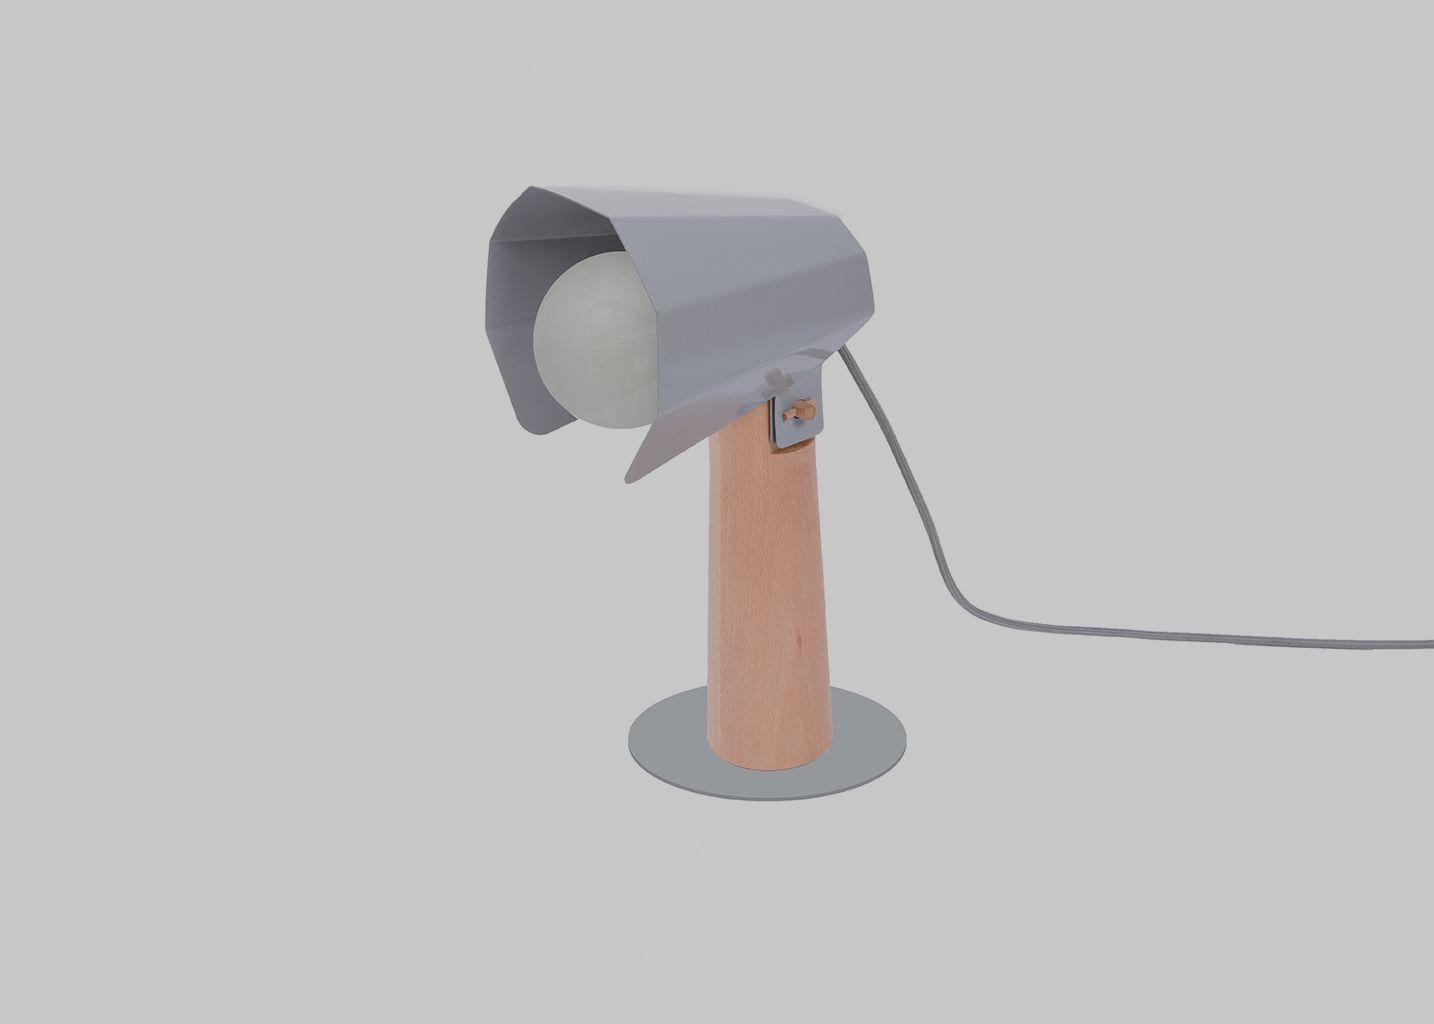 Lampe Brother - Eno Studio